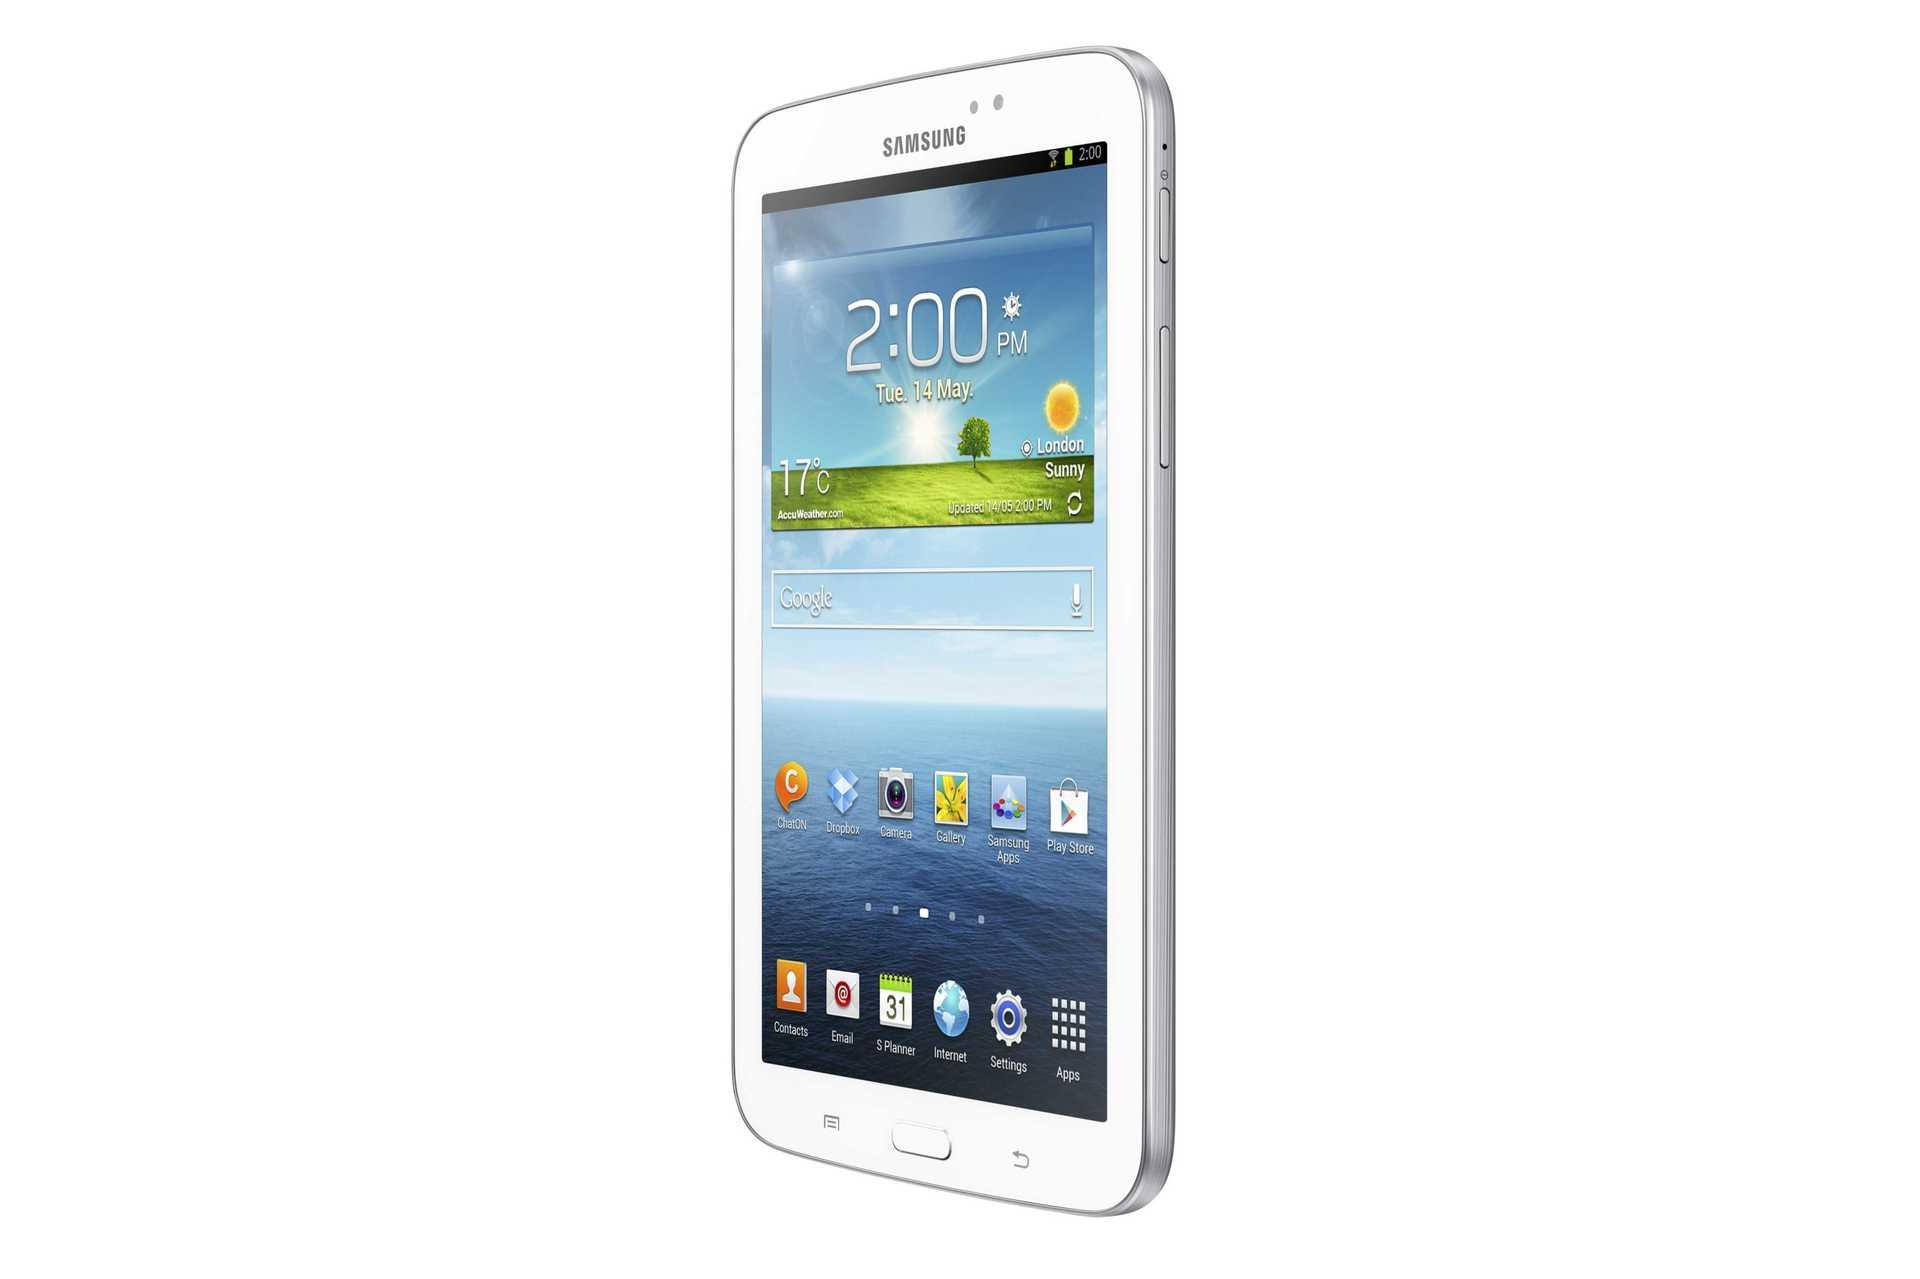 Primi benchmark per il Samsung Galaxy Tab 3 7.0